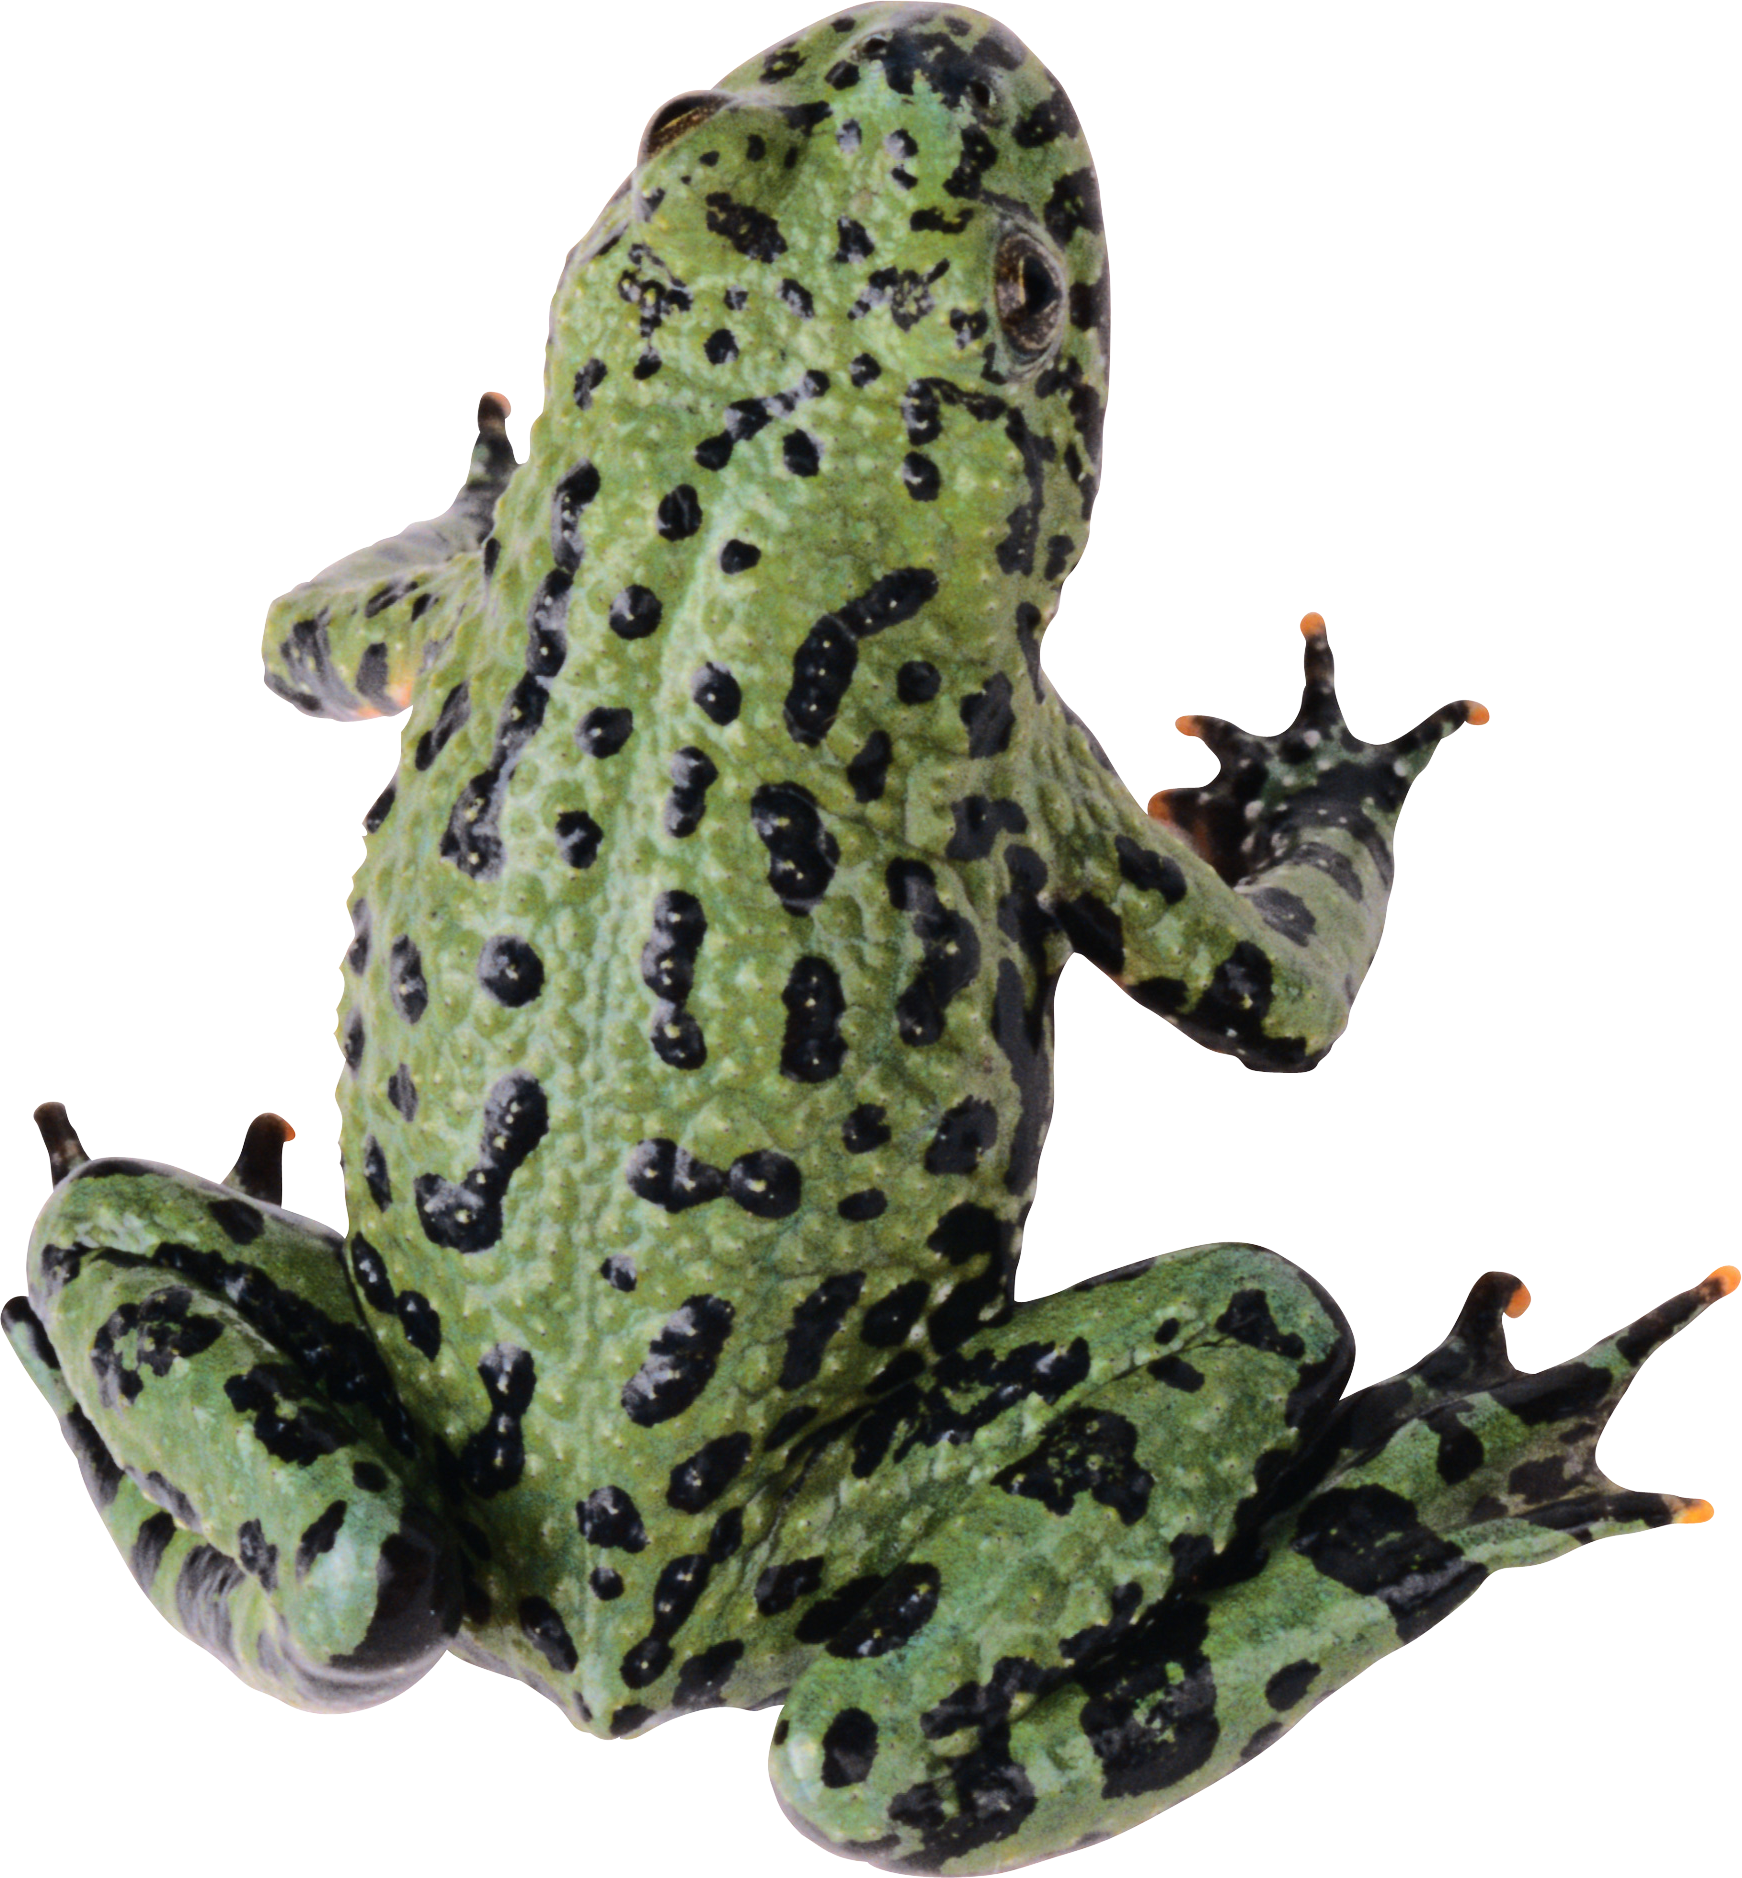 Frog PNG image hd